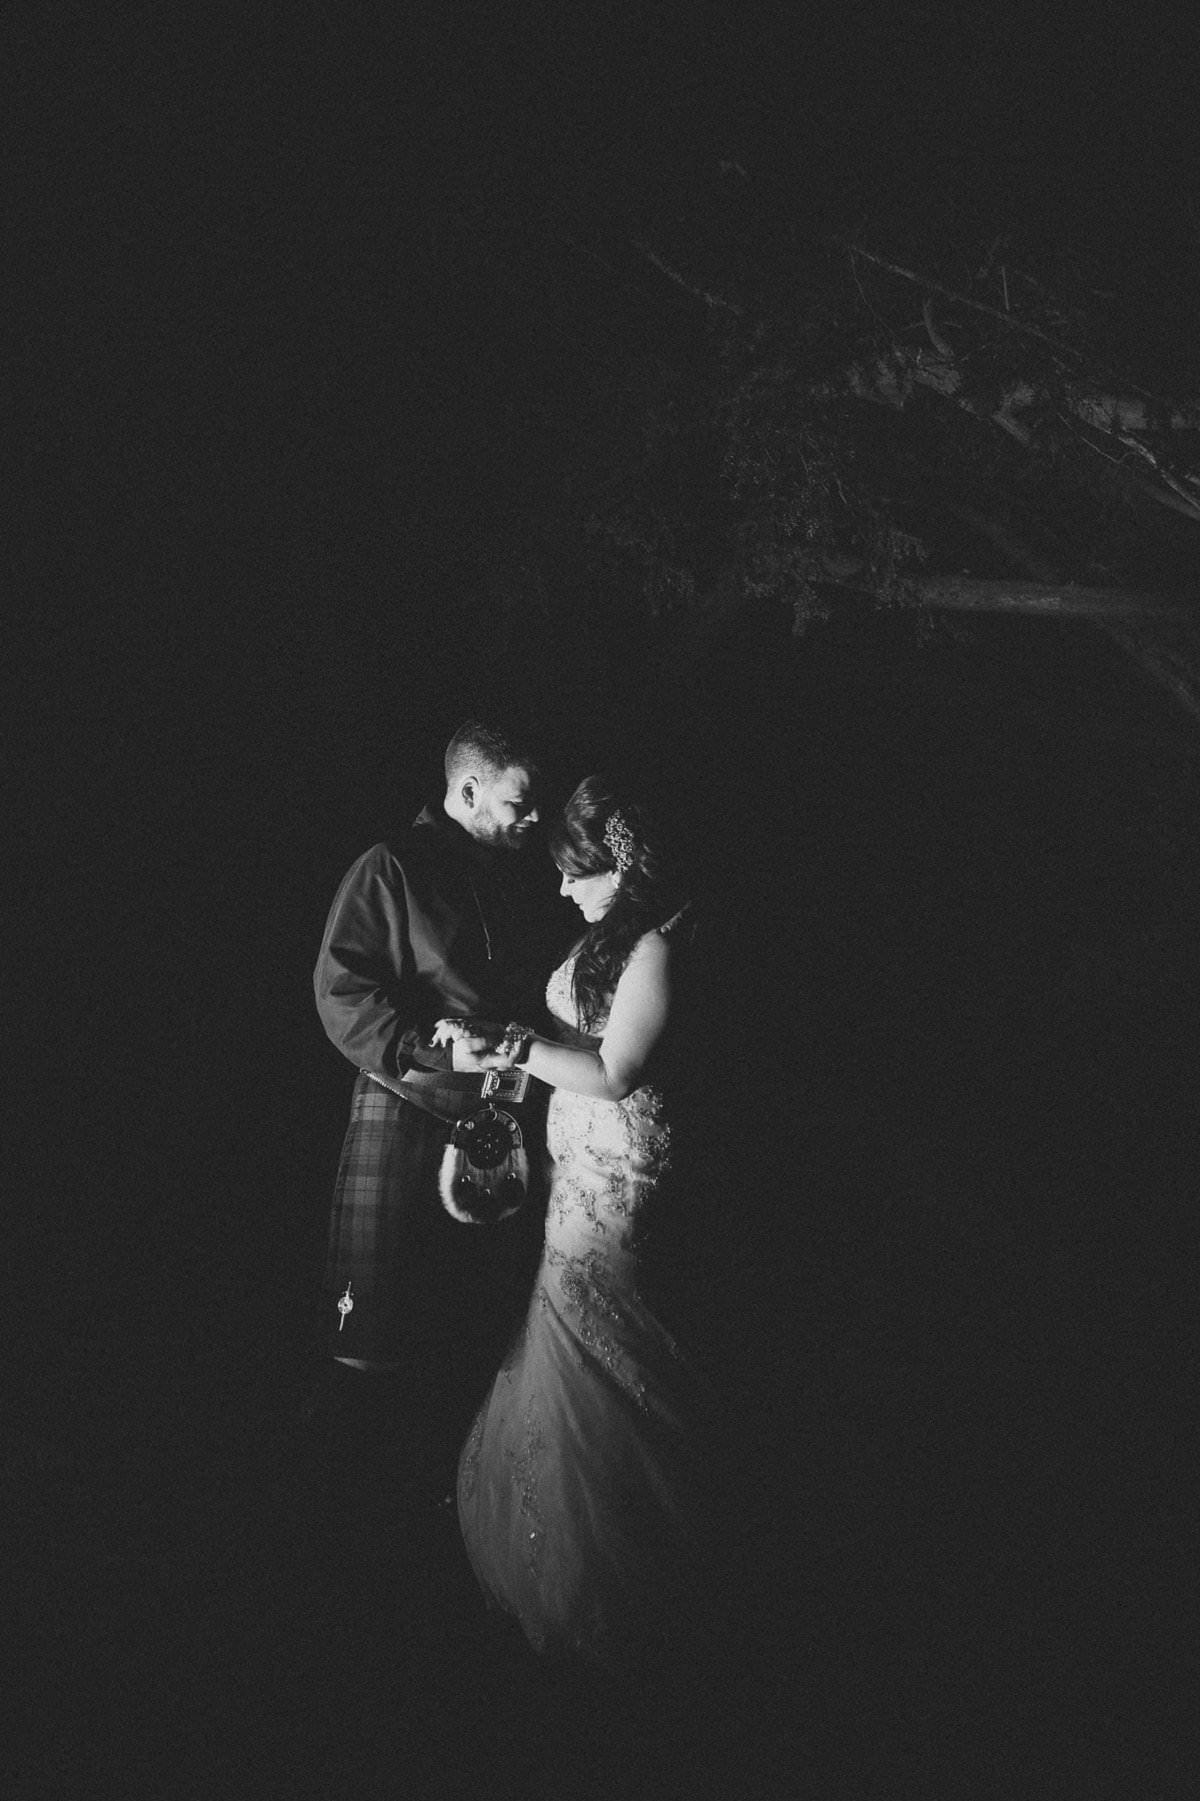 fine-art-wedding-photography-edinburgh-rosslyn-oxenfoord-castle-199